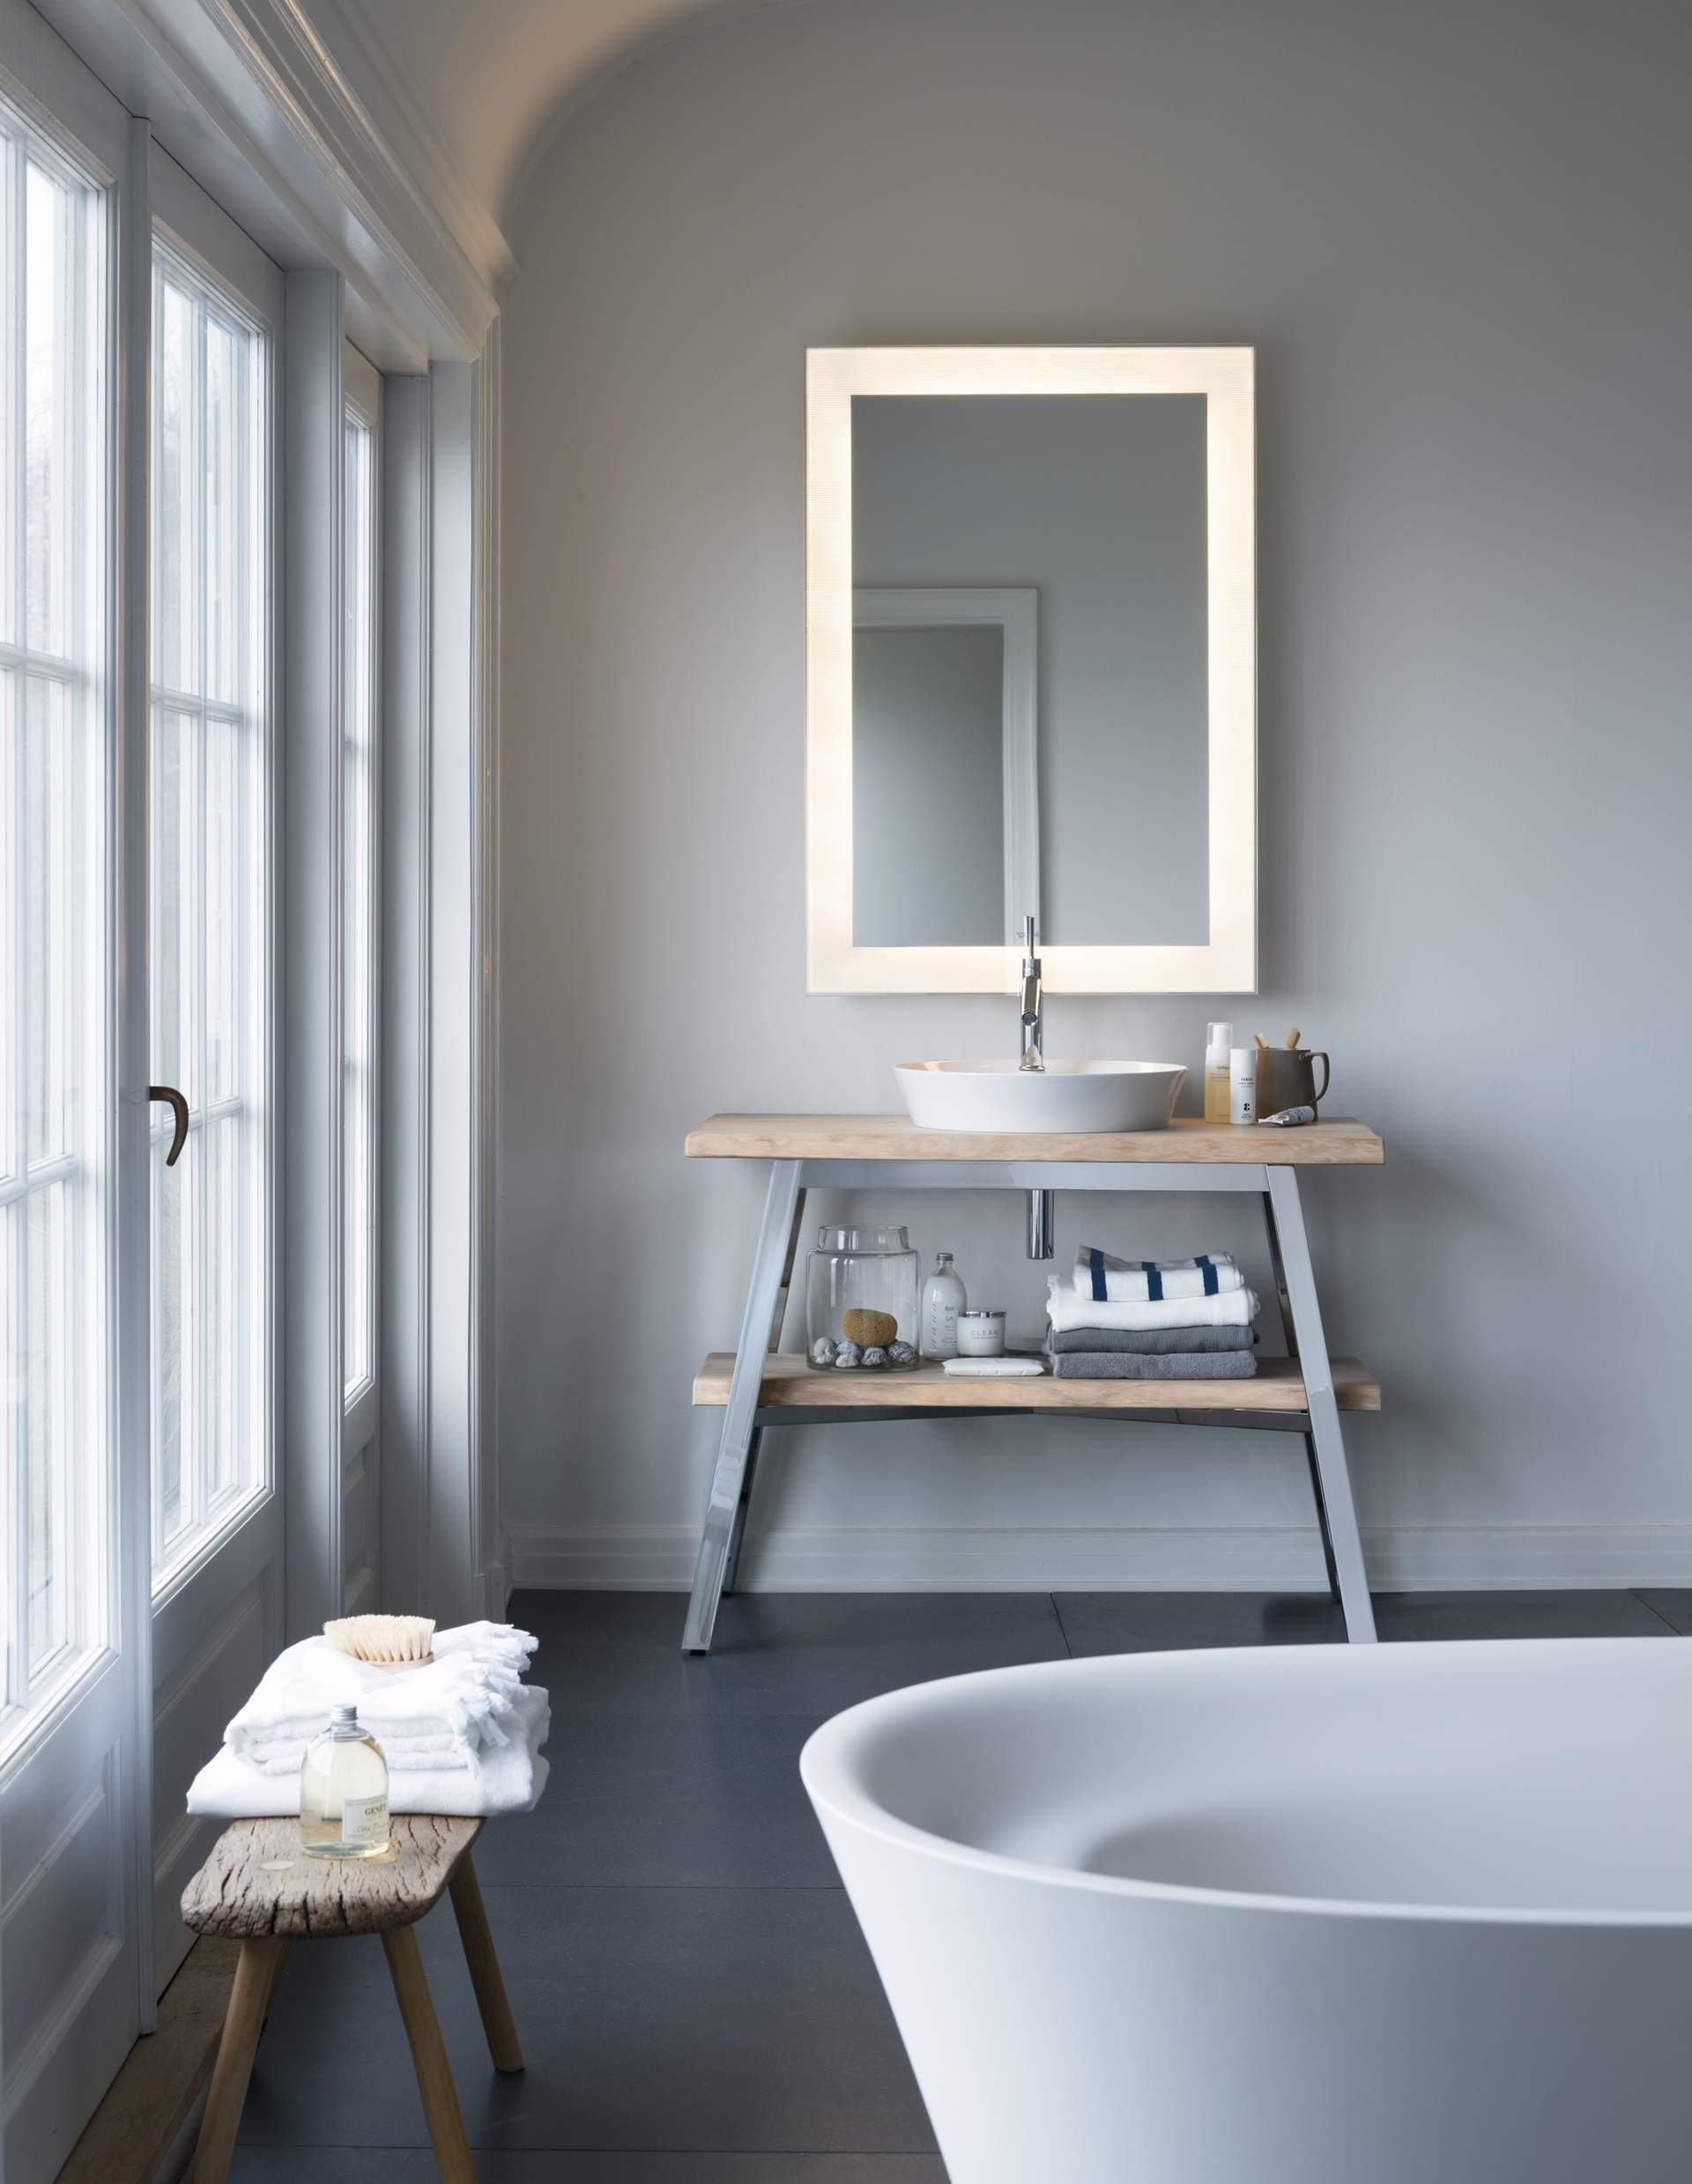 Aménager une salle de bain inspiration bois - Gazellemag